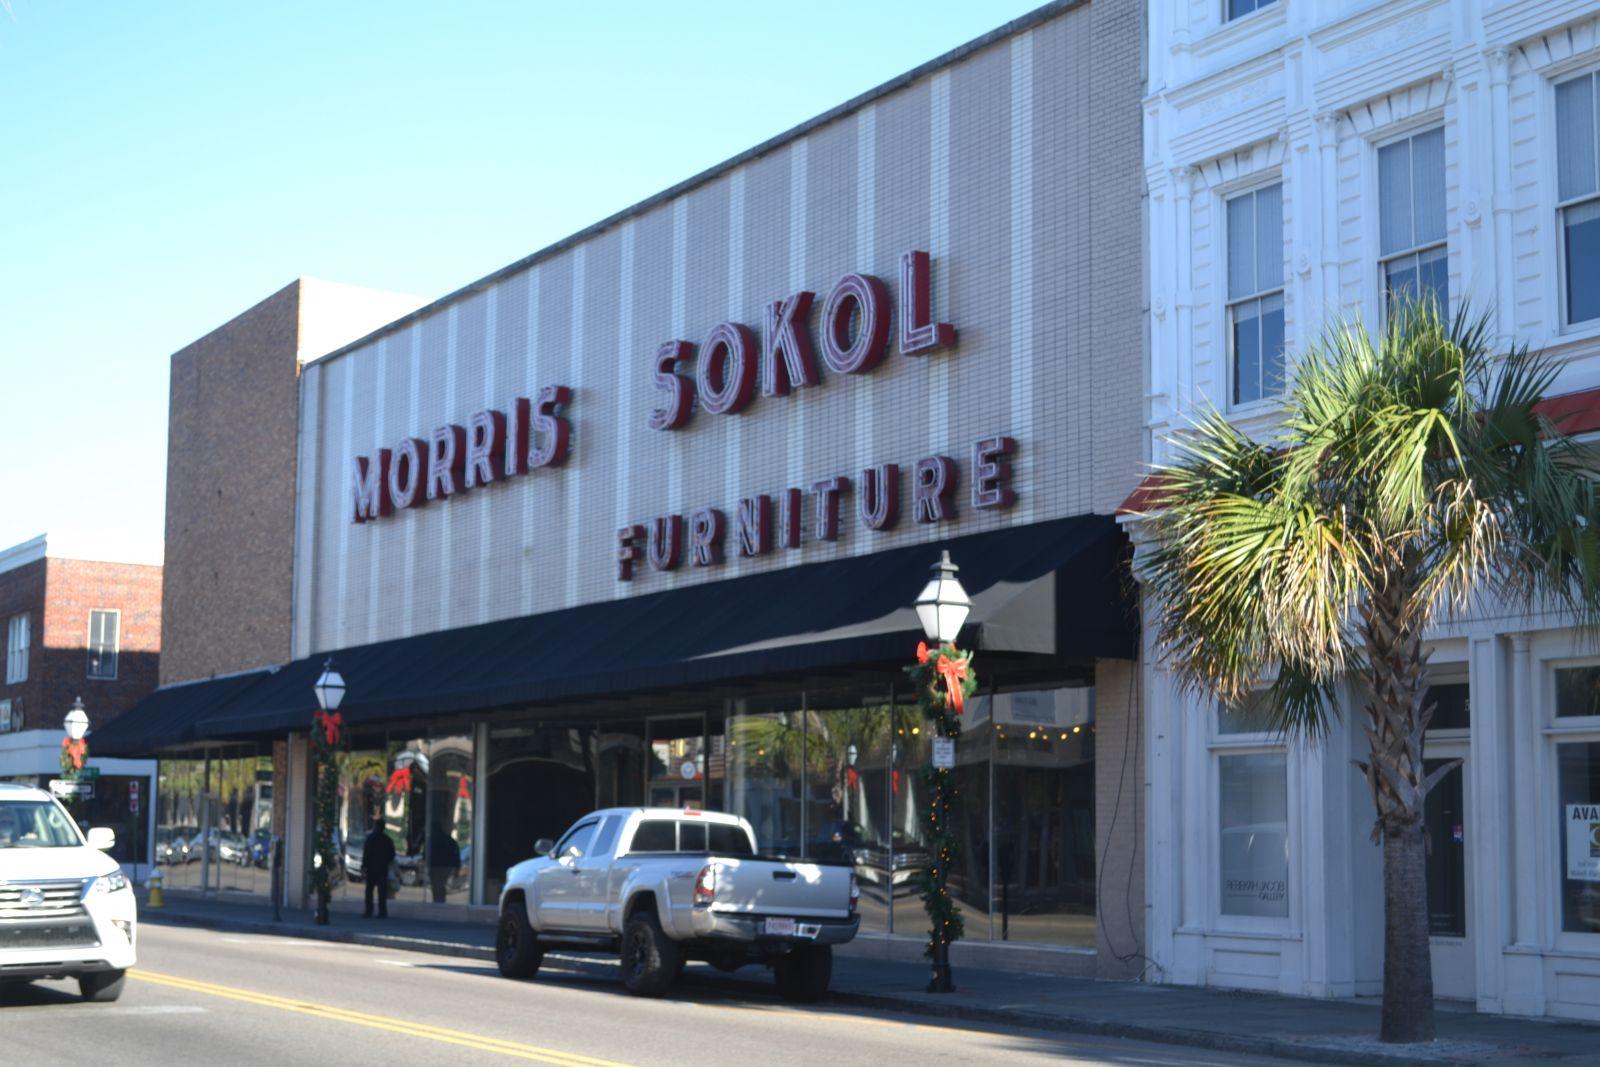 Design Charrette Planned For Former Morris Sokol Site In